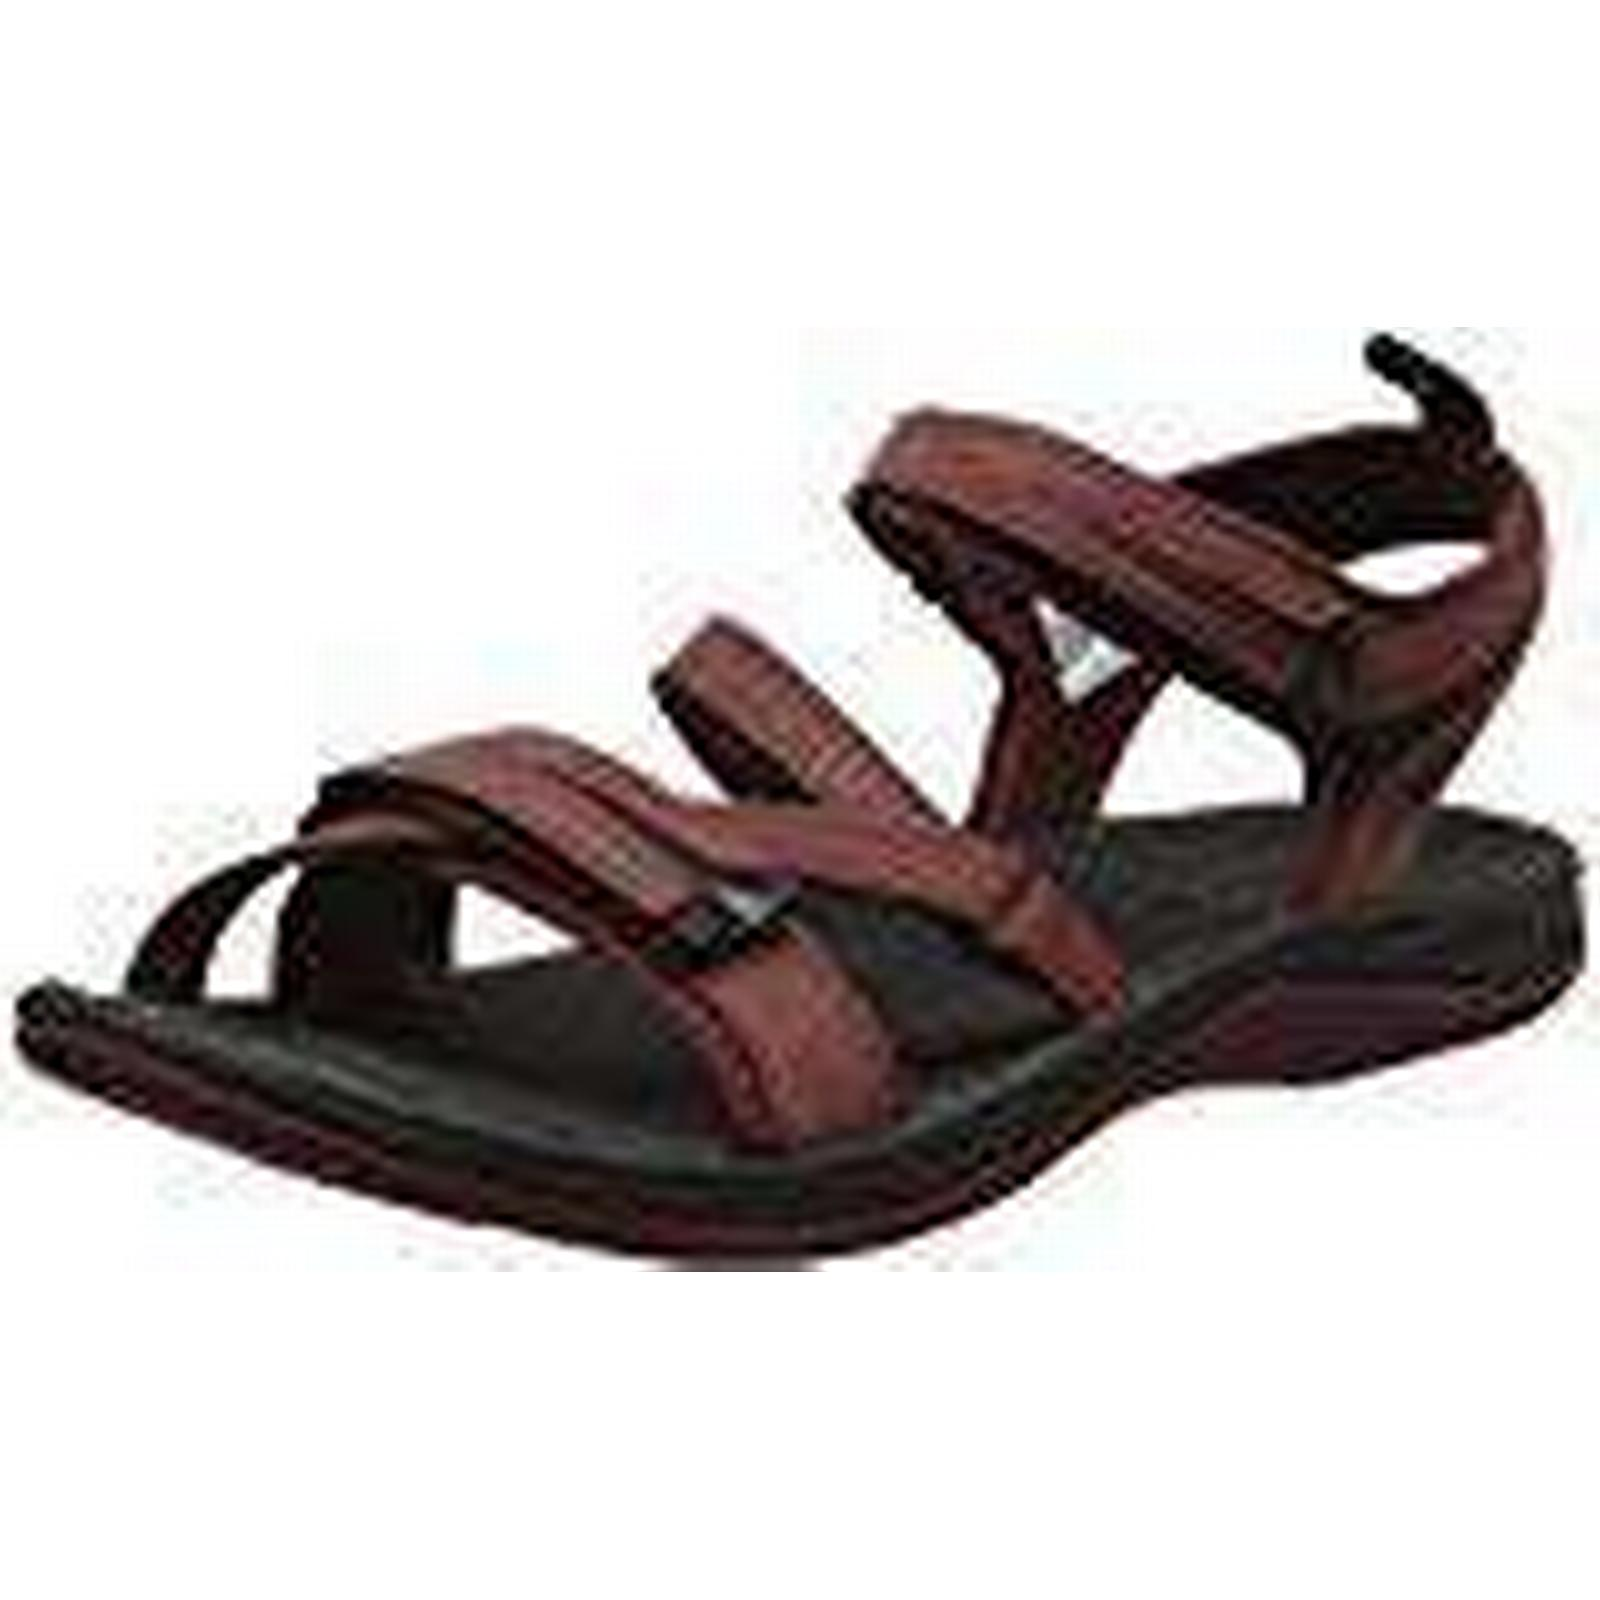 Merrell Women Siren Strap Purple Q2 Open Toe Sandals, Purple Strap (Chocolate Truffle), 4 UK (37 EU) 450ee0